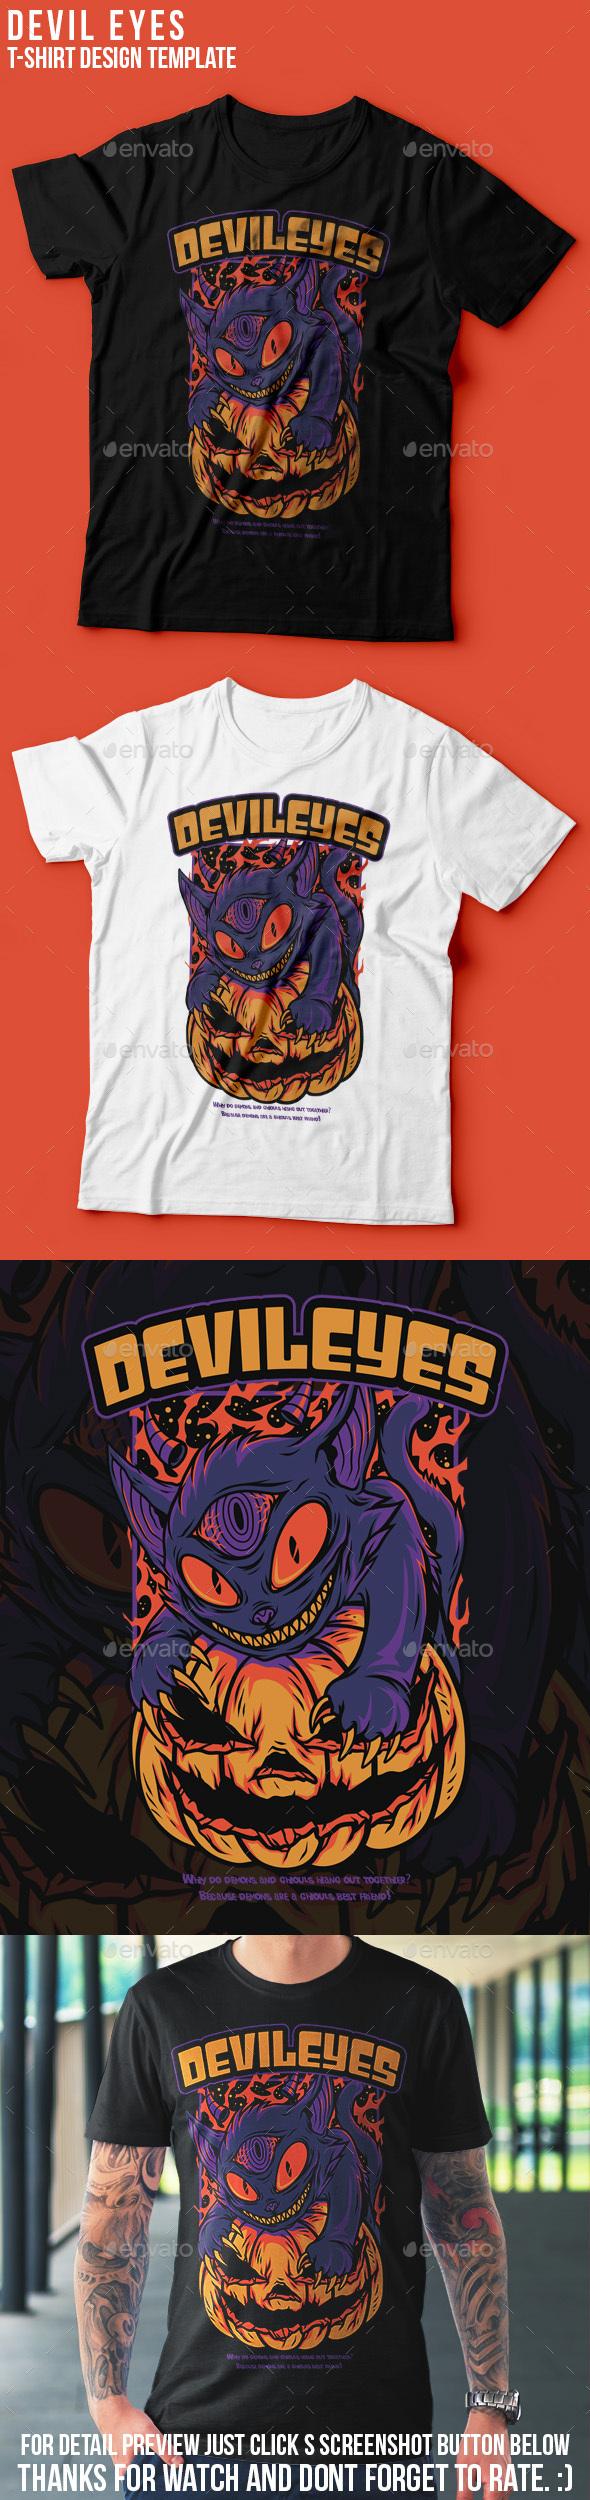 Devil Eyes Halloween T-Shirt Design